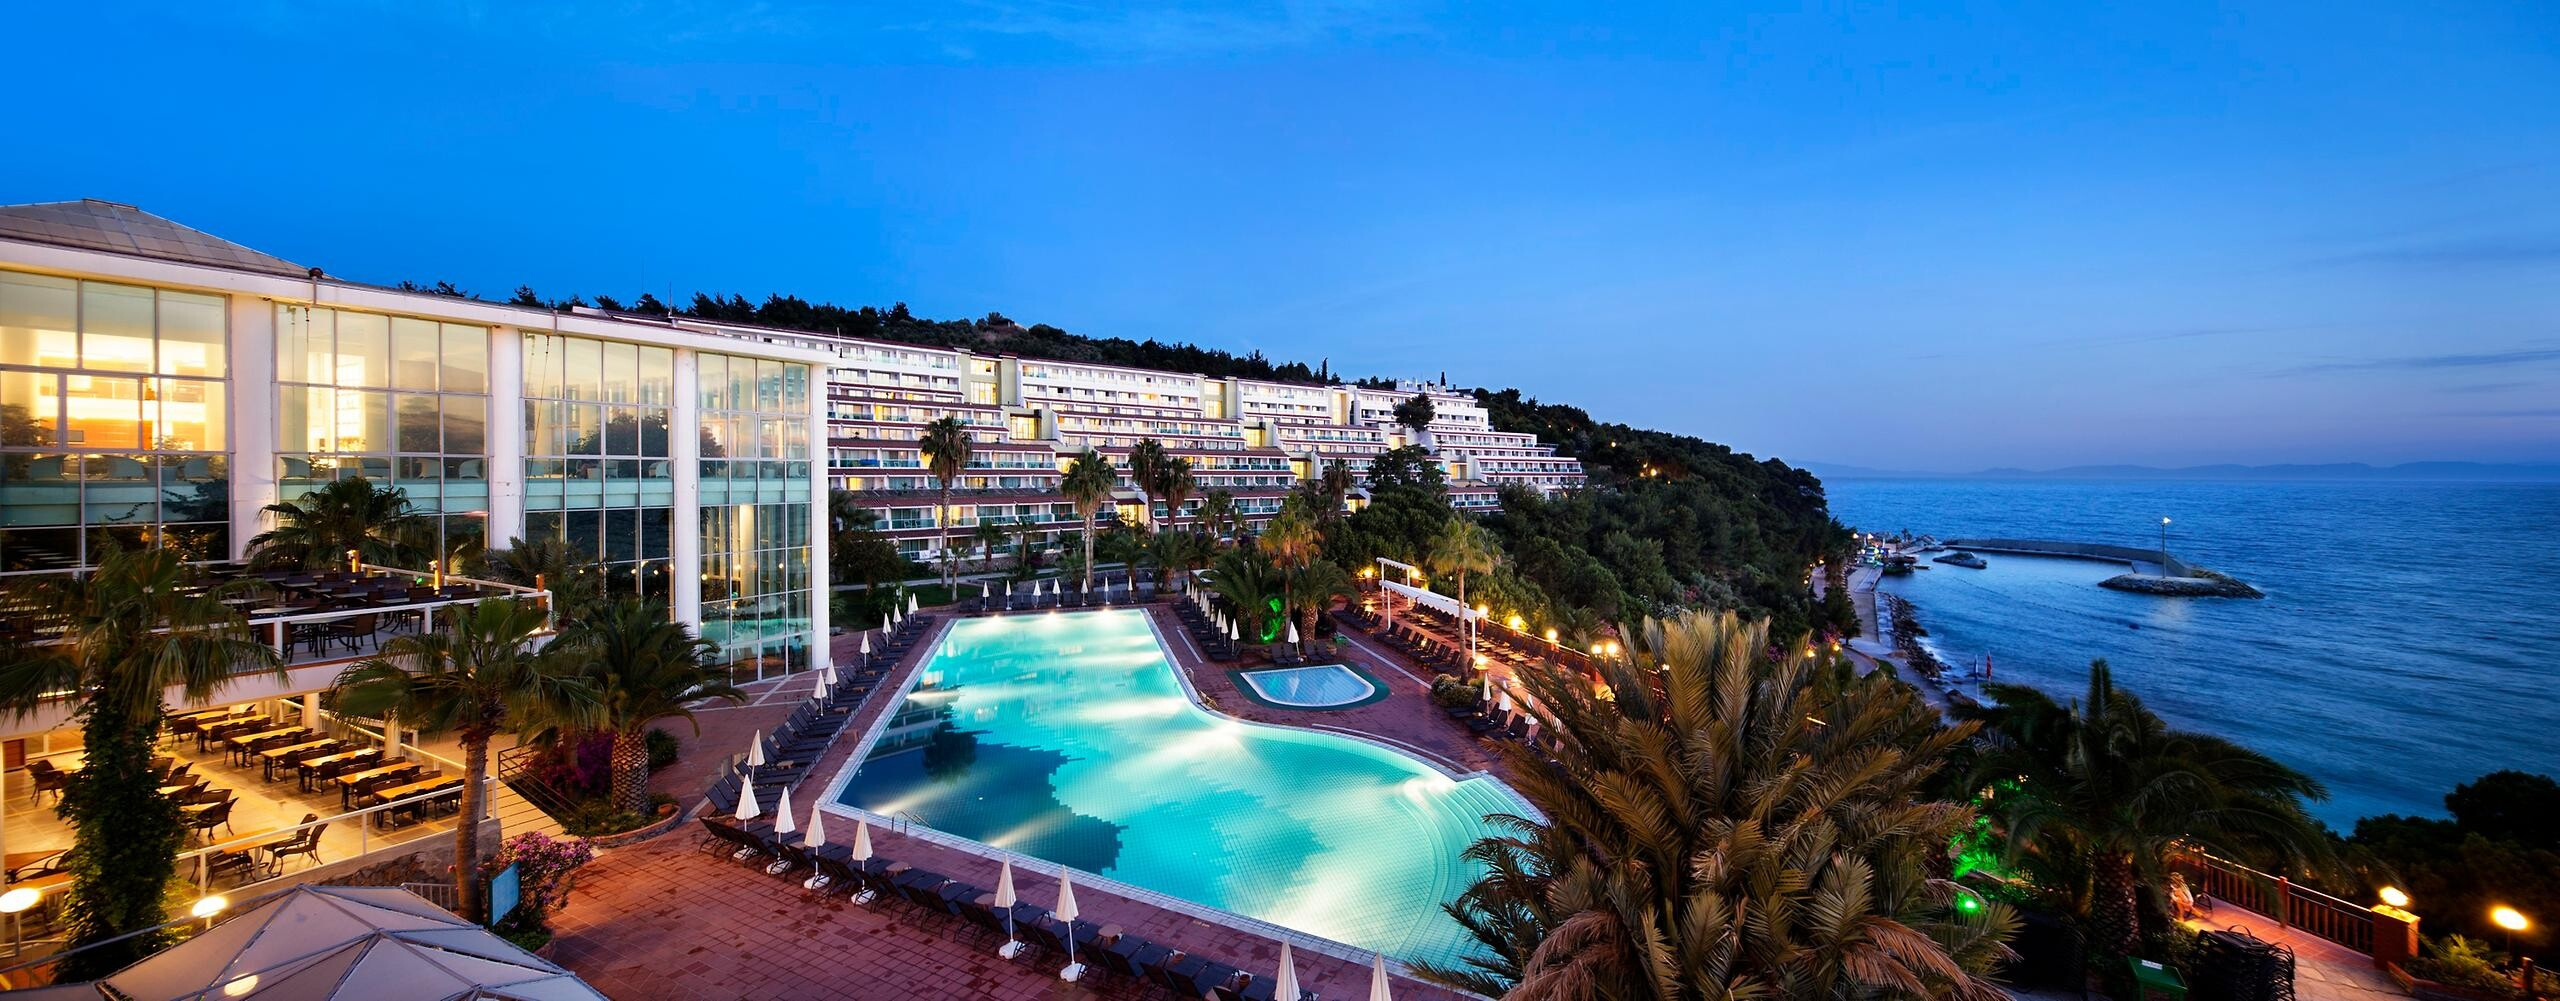 Pine Bay Holiday Resort - нощна